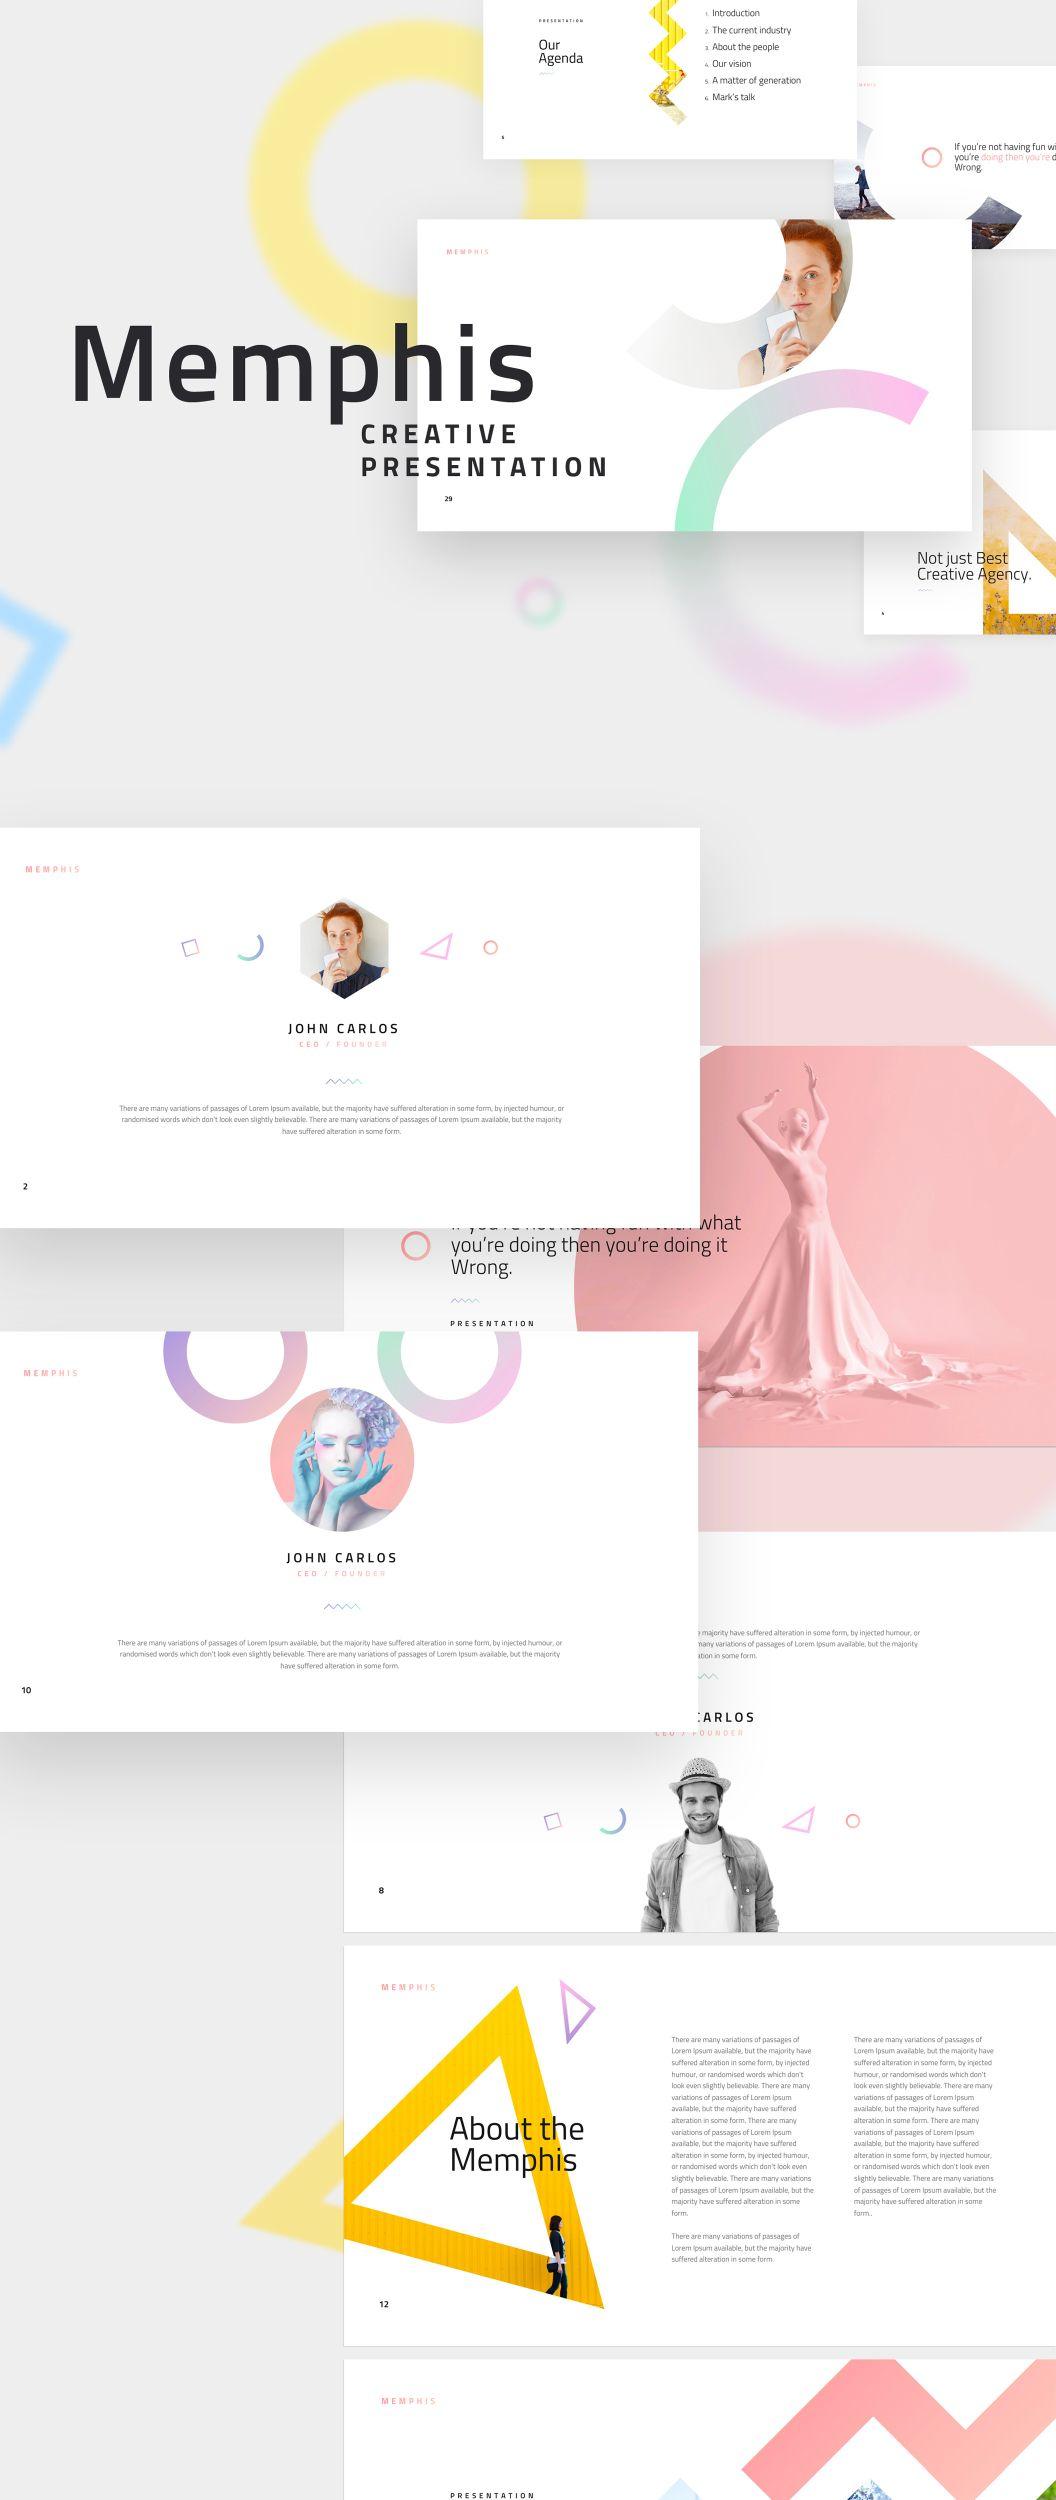 Ui8 Products Memphis Unique Web Design Presentation Presentation Design